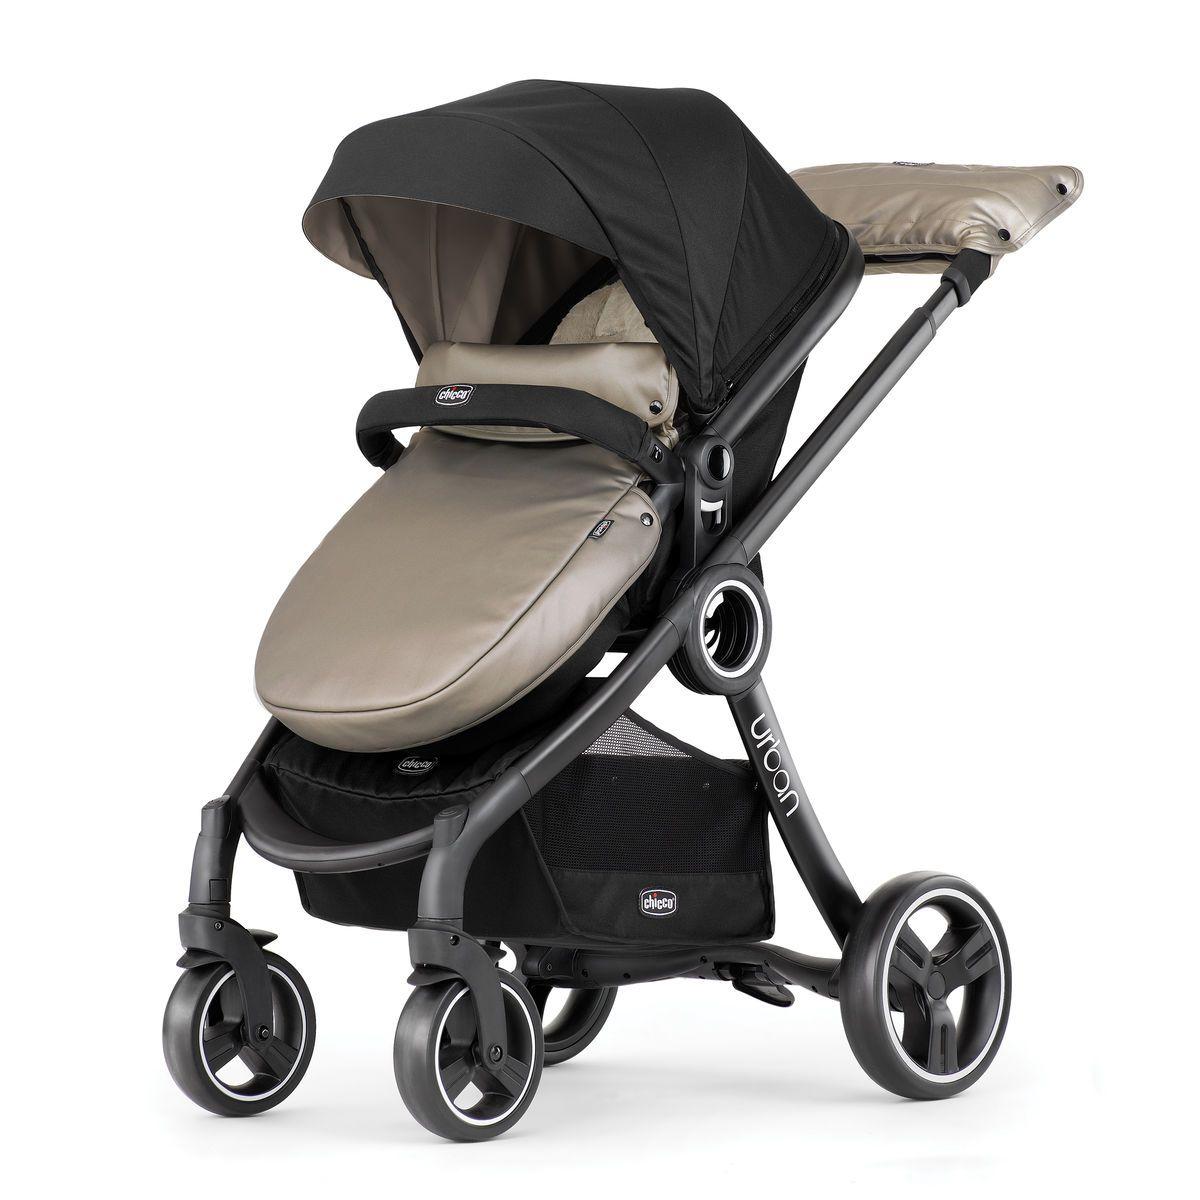 Chicco Urban 6 in 1 Modular stroller - Truffle | Modular ...